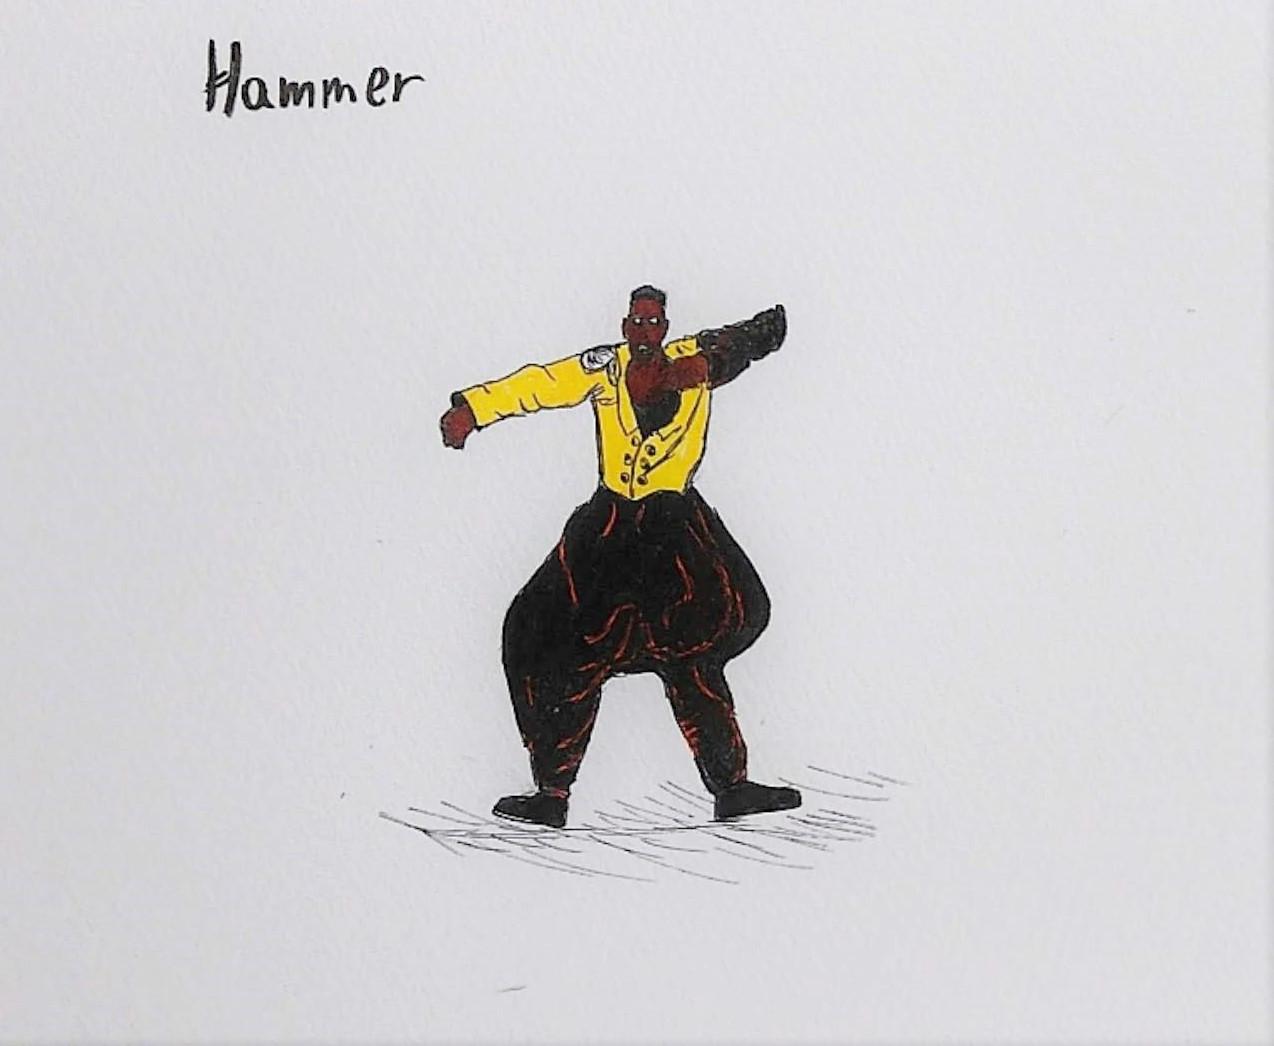 Hammer (Inktober 52 – Week 6)